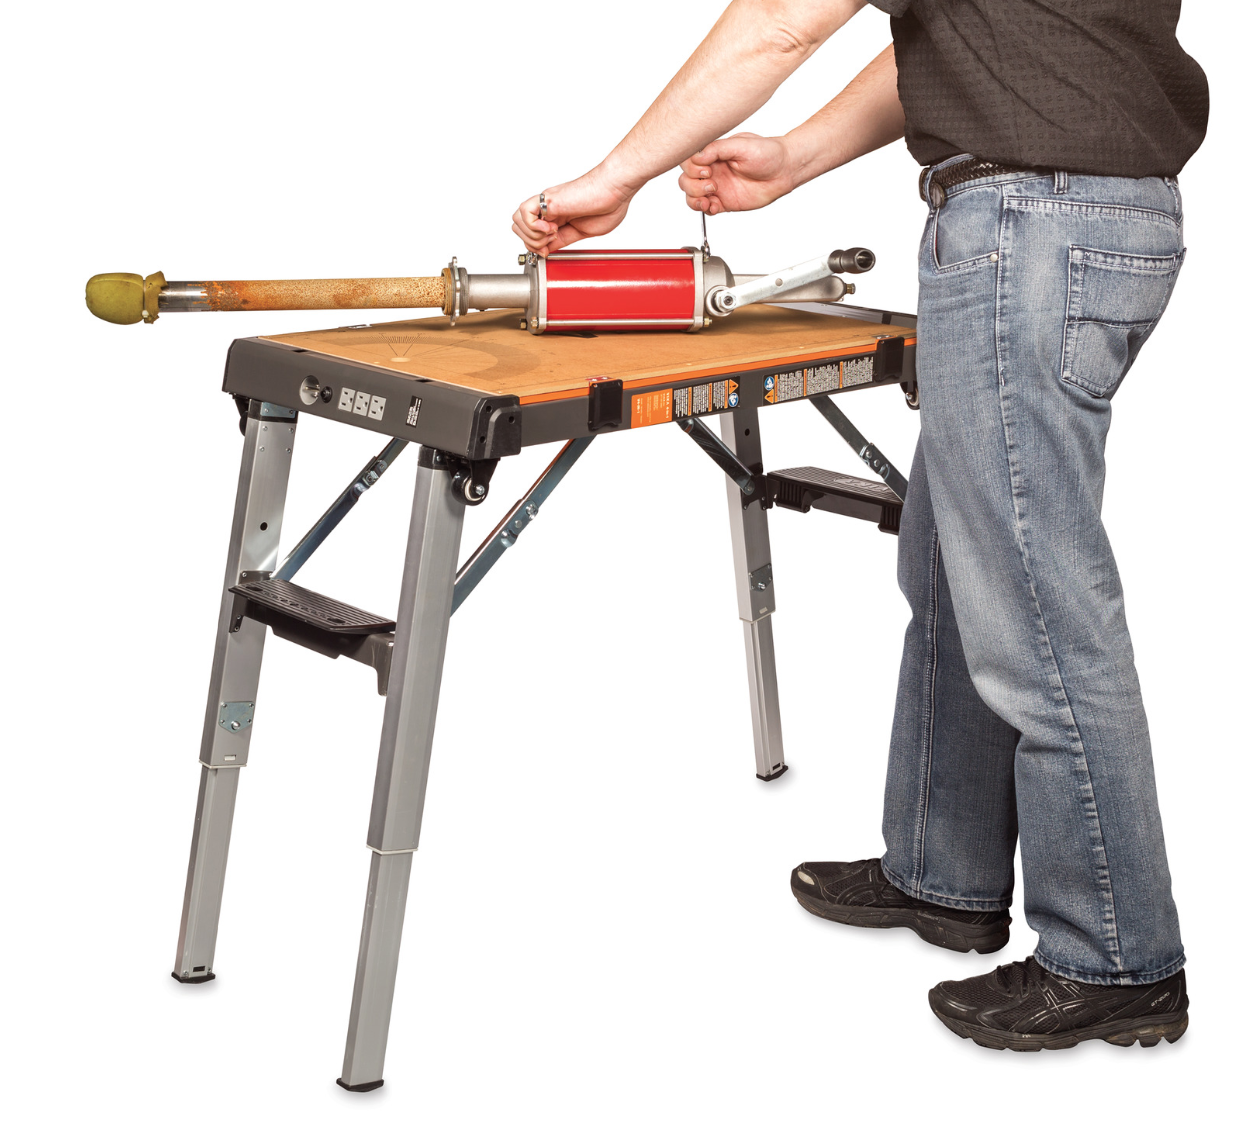 Vika Work Bench Vika 4 In 1 Portable Detailing Platform Workbench By